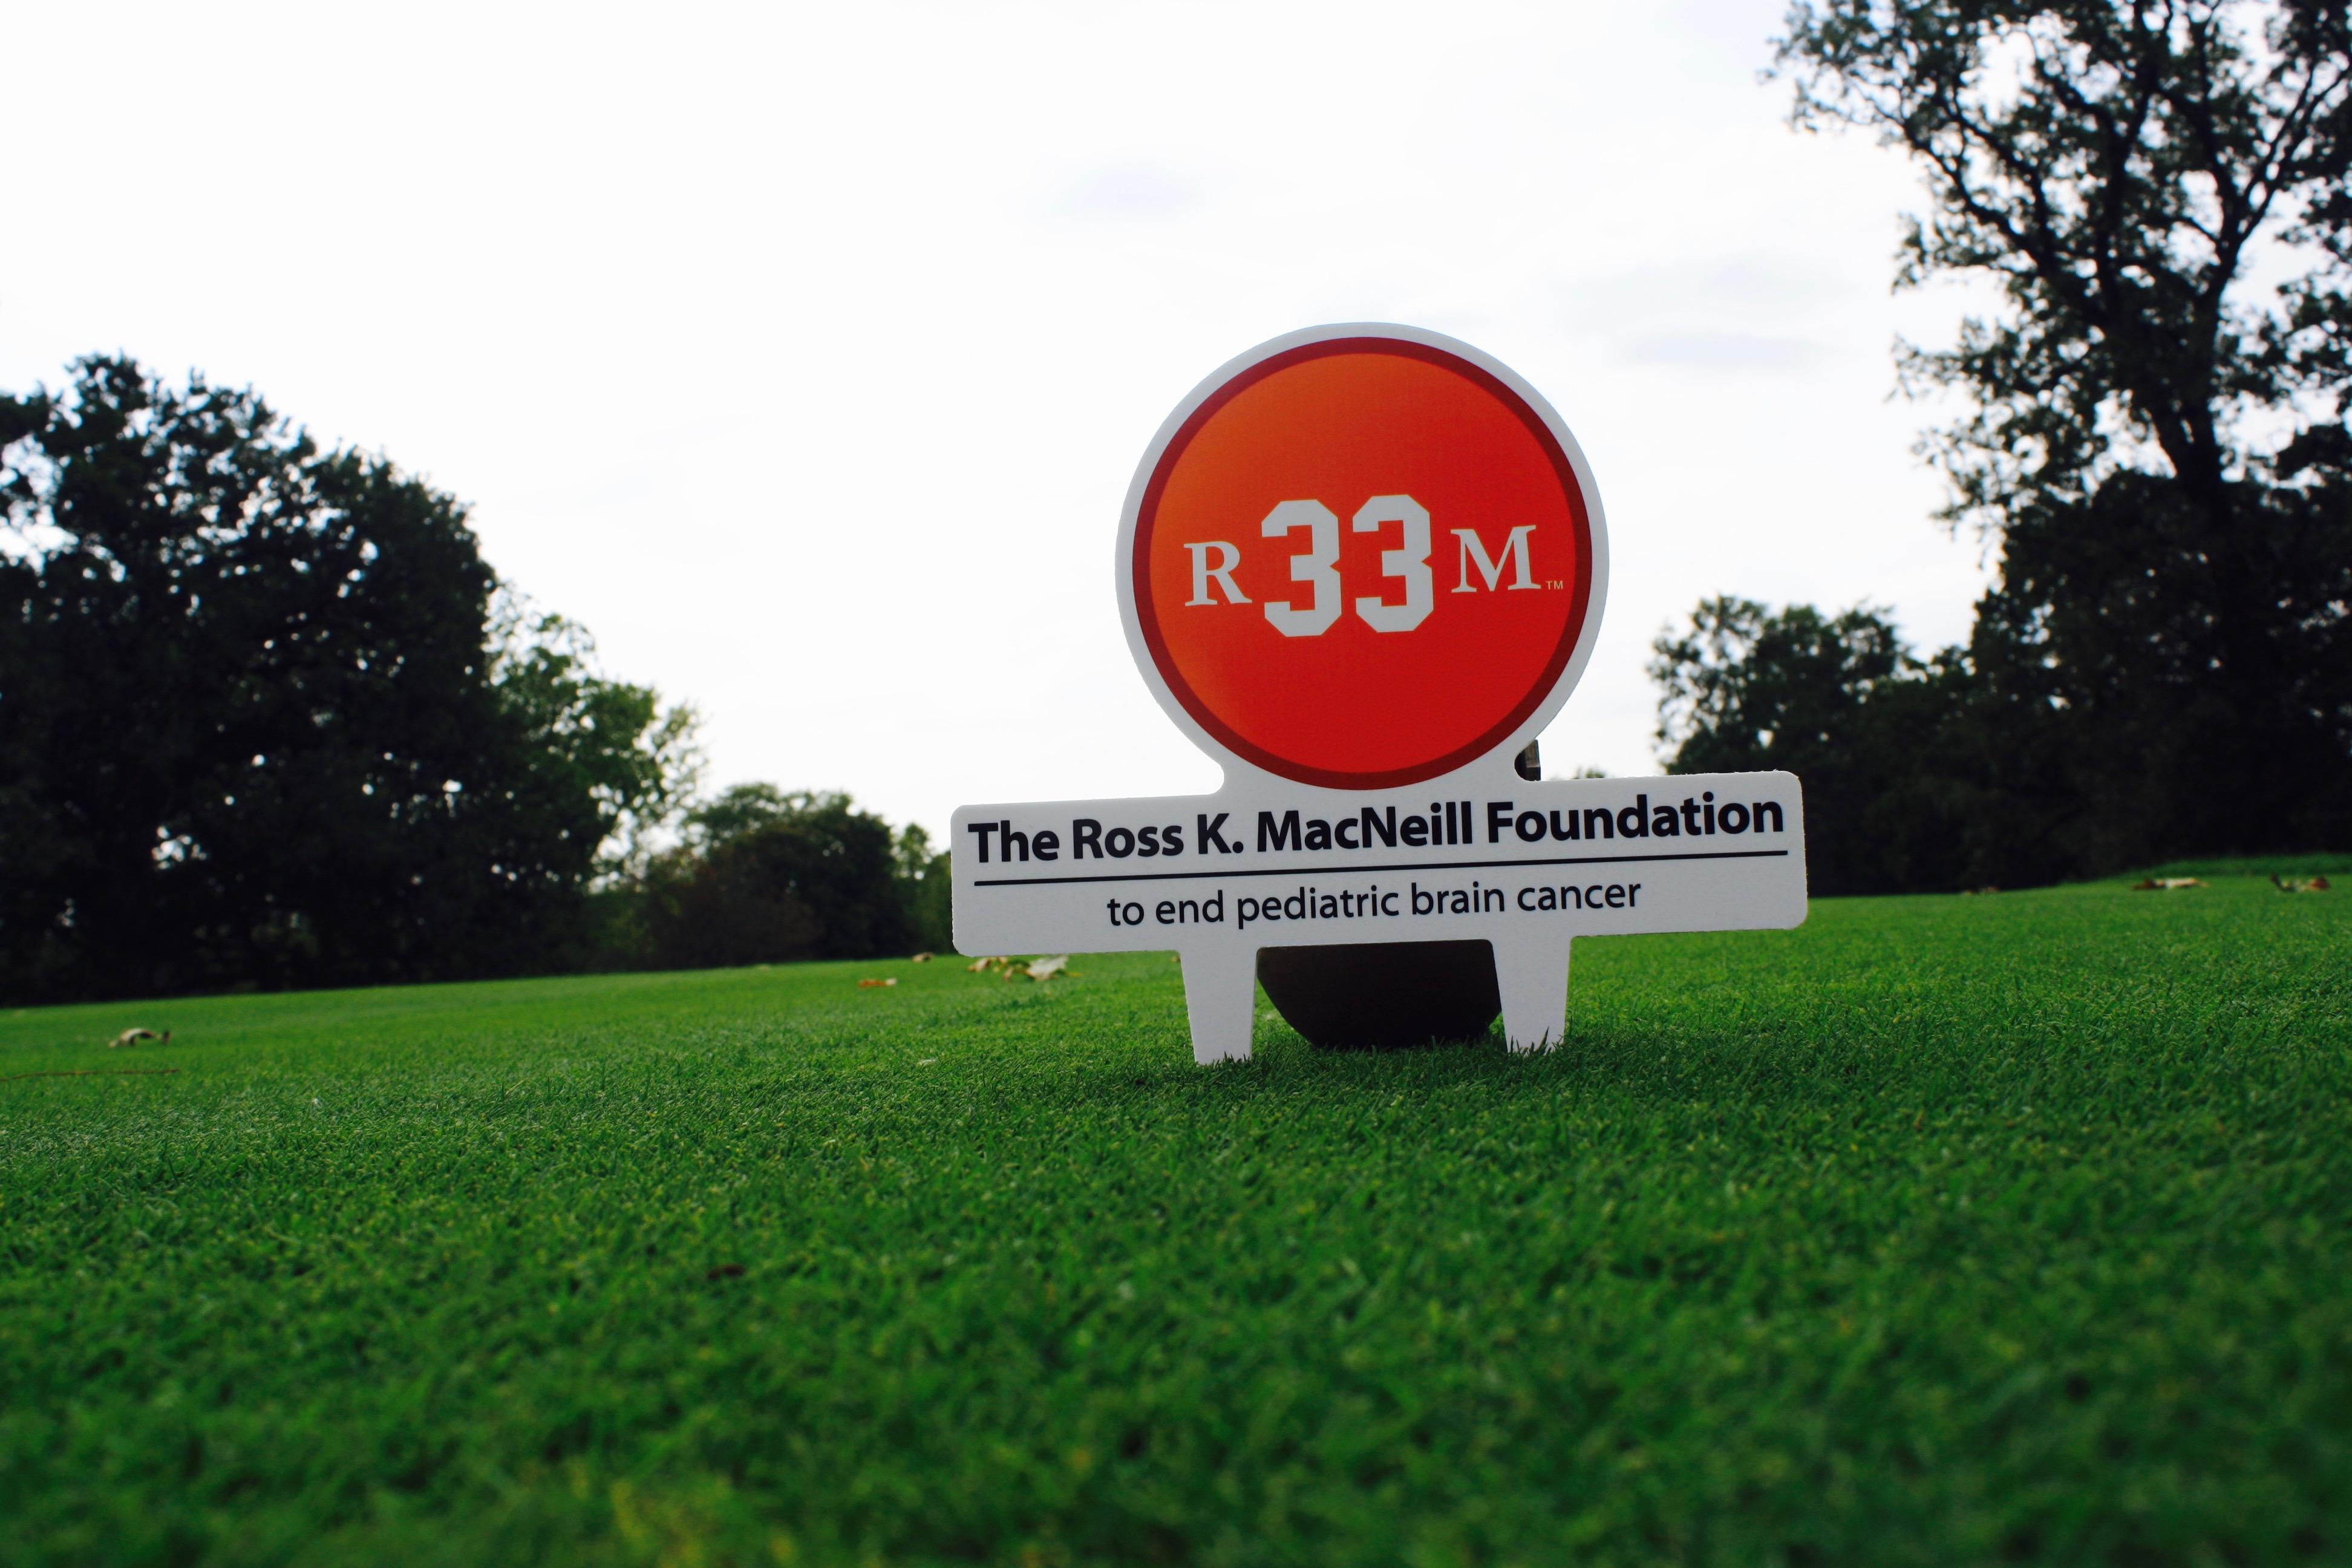 R33M Golf Classic